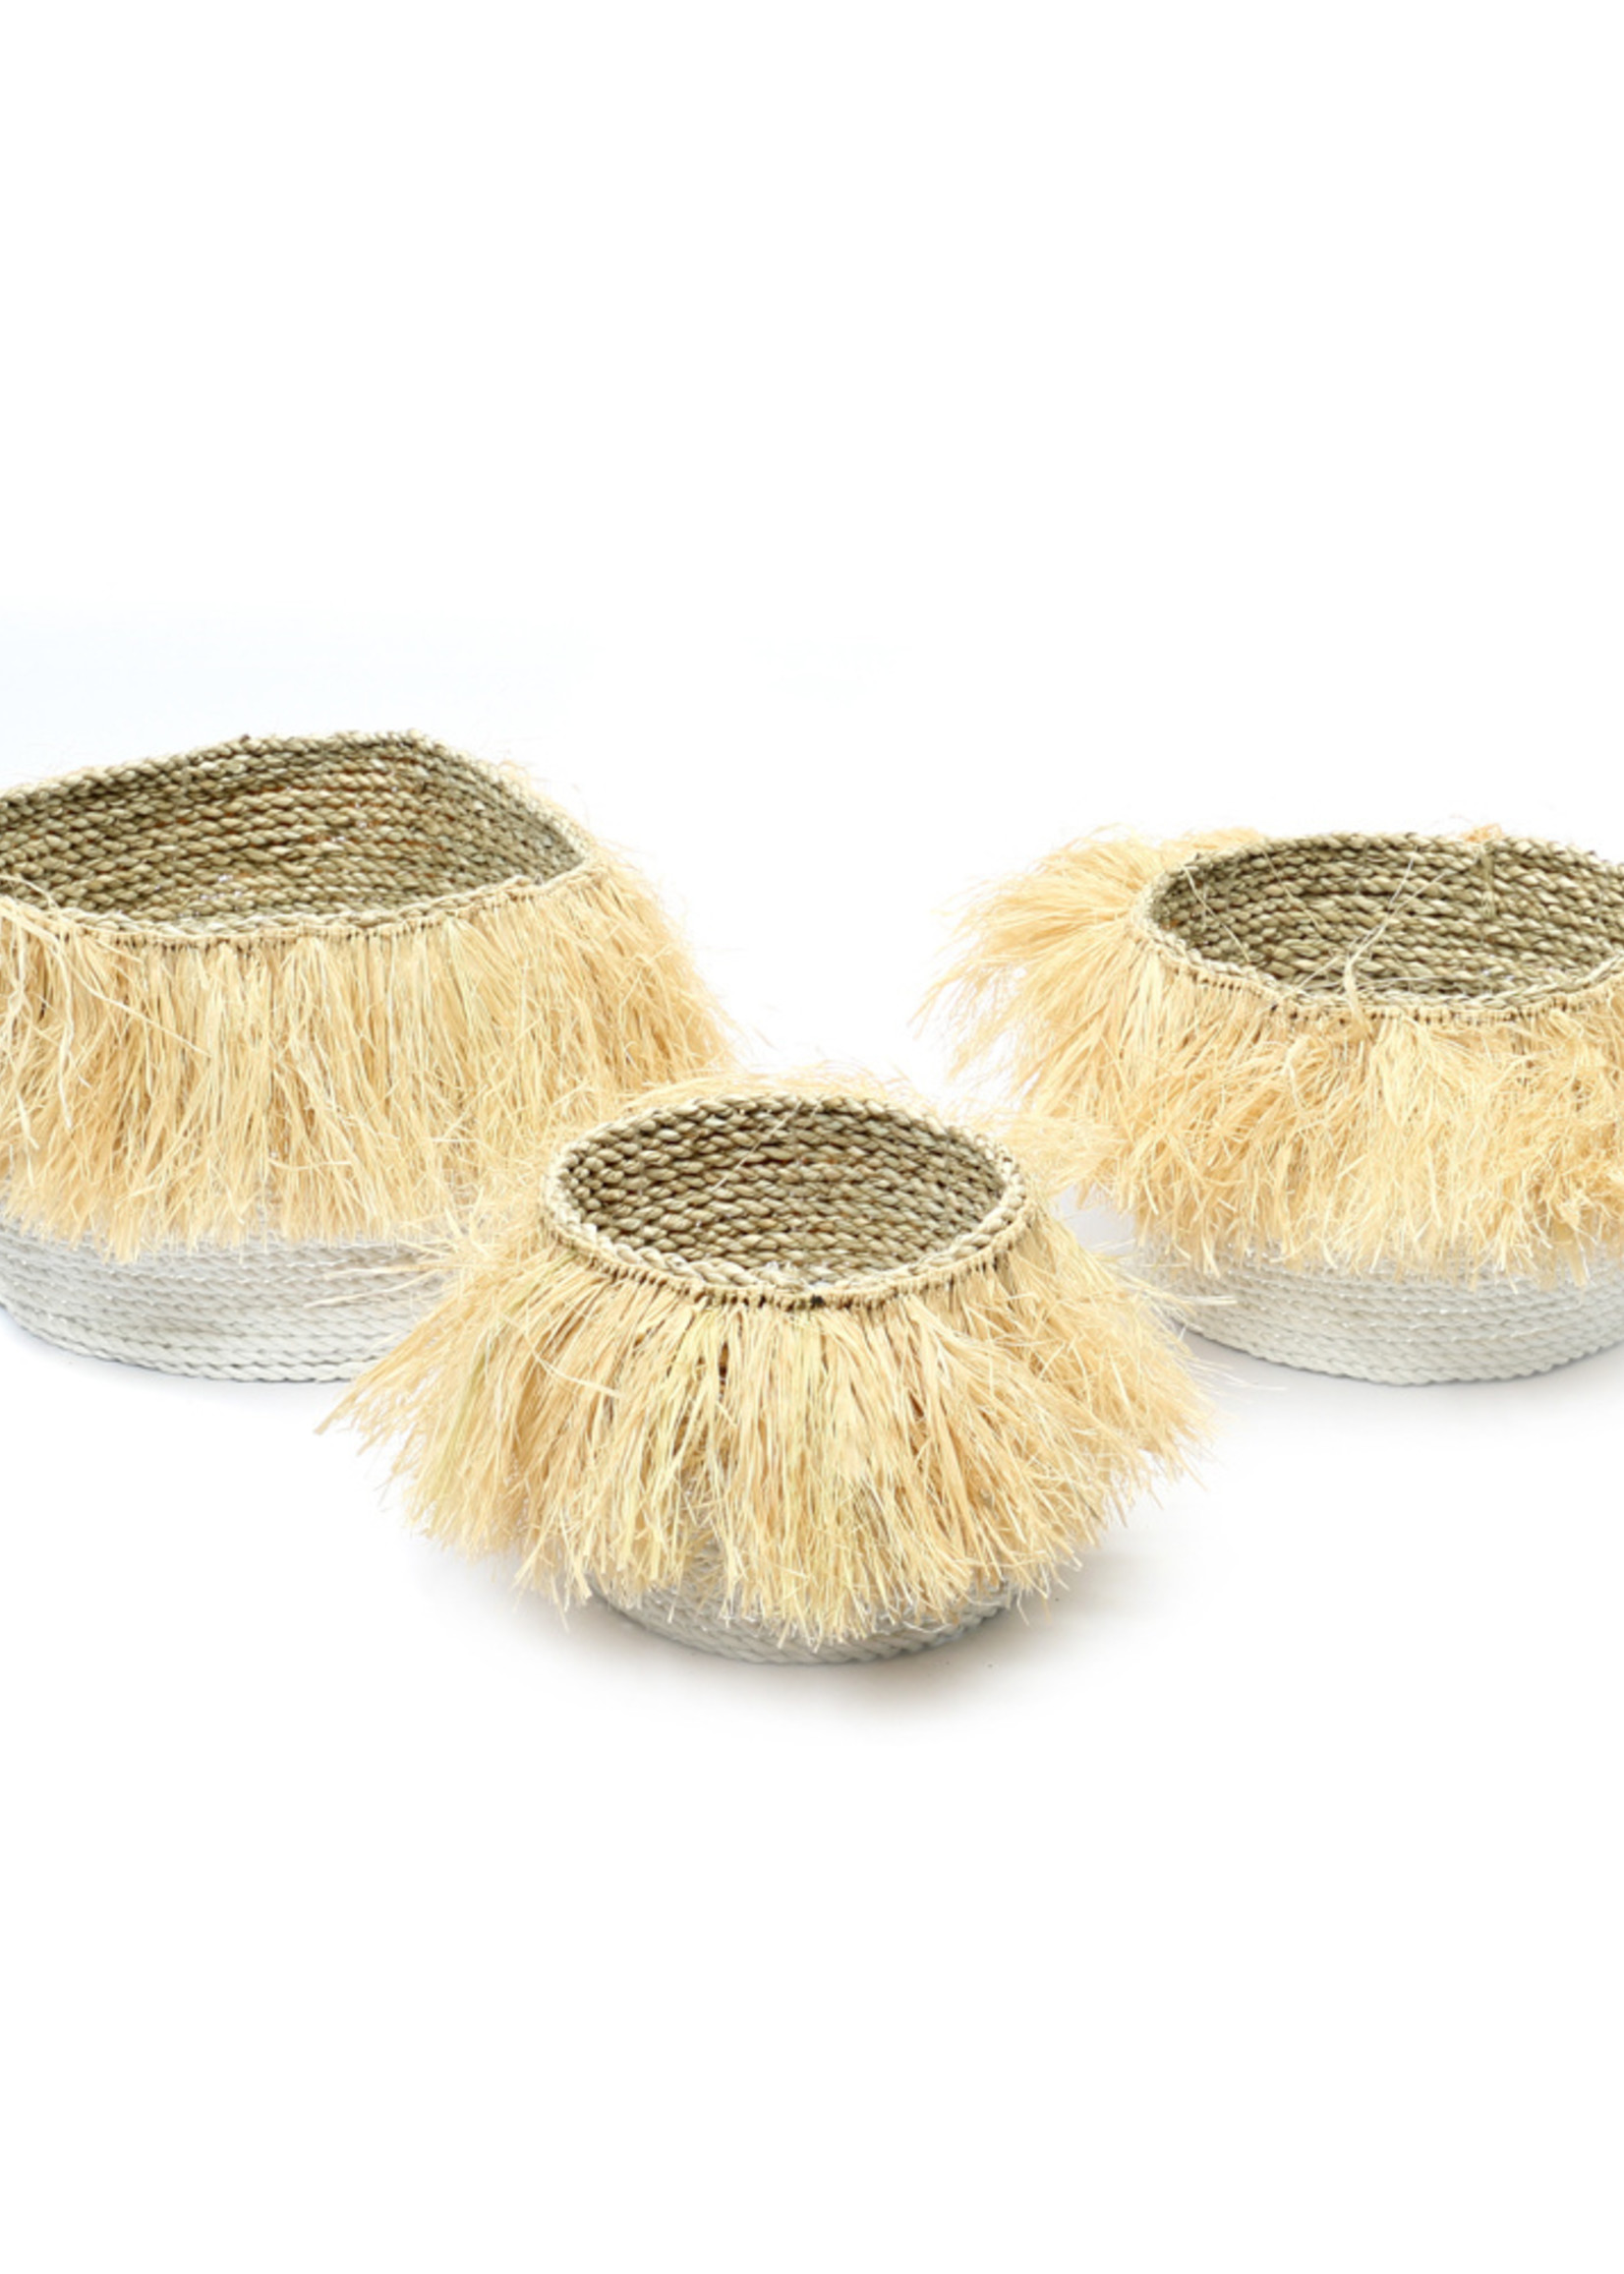 The Aloha Baskets - White Natural - SET3